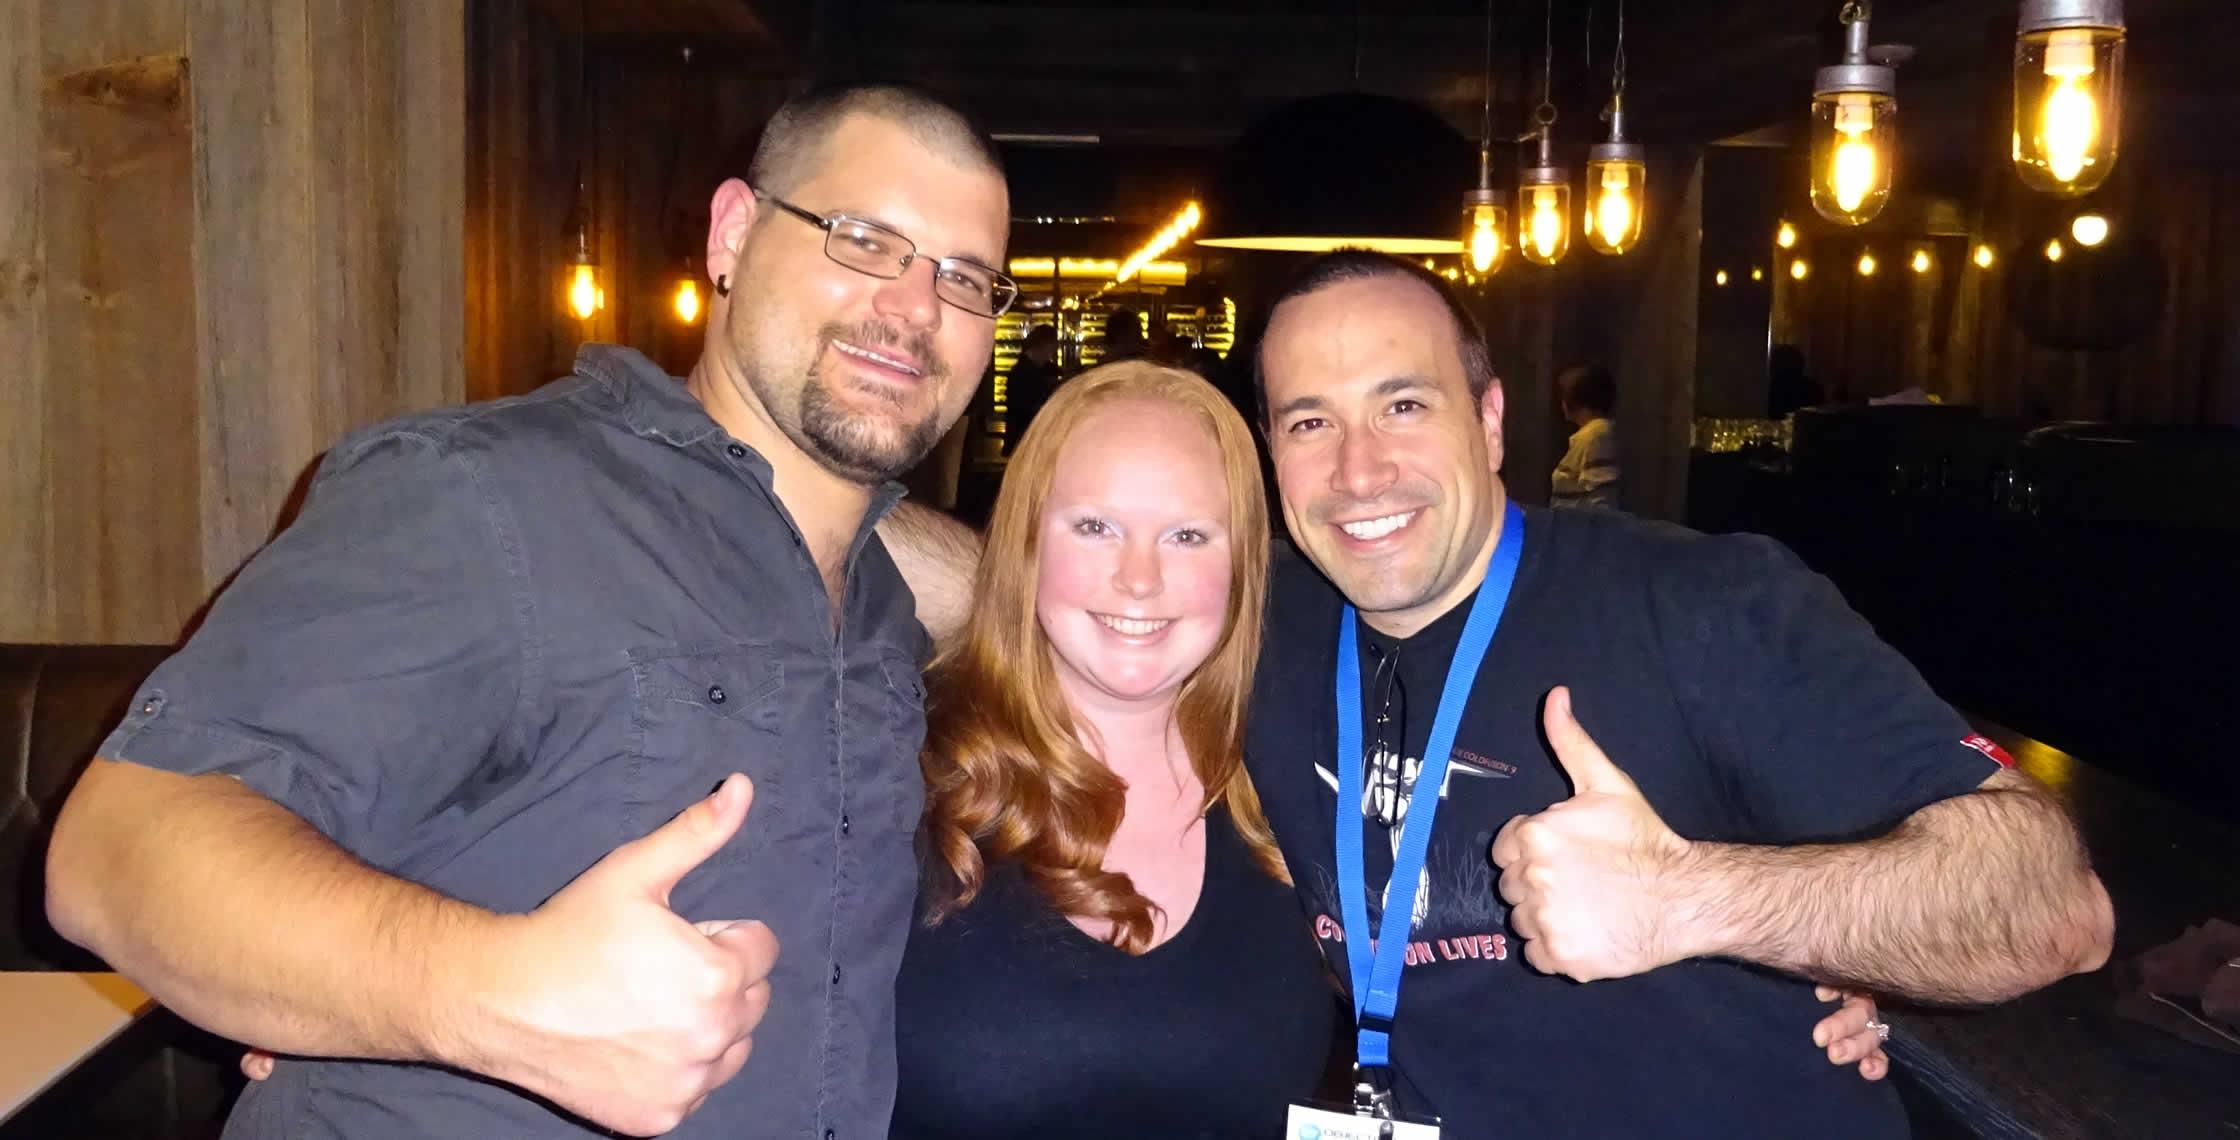 Ben Nadel at cf.Objective() 2014 (Bloomington, MN) with: Josh Siok and Megan Siok